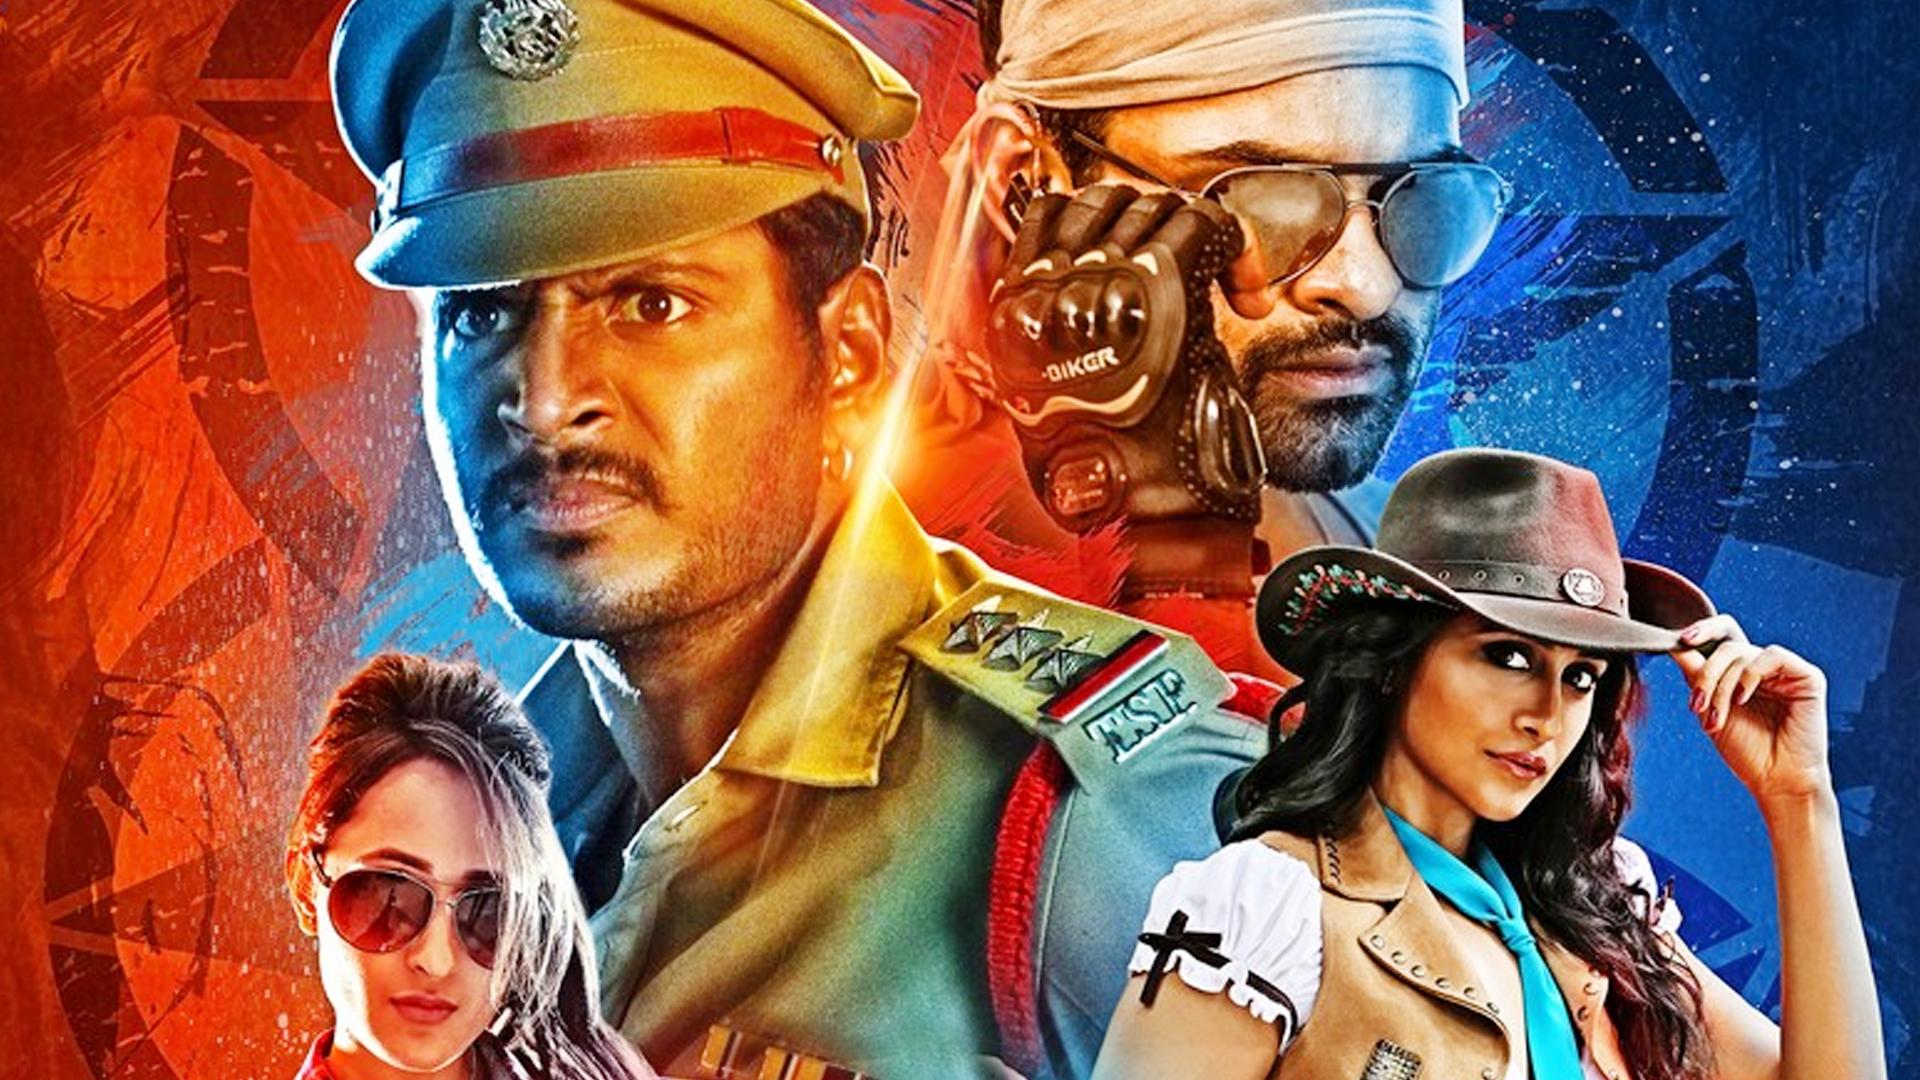 Kabali Telugu Full Movie Online Watch Kabali Telugu In Full Hd Quality